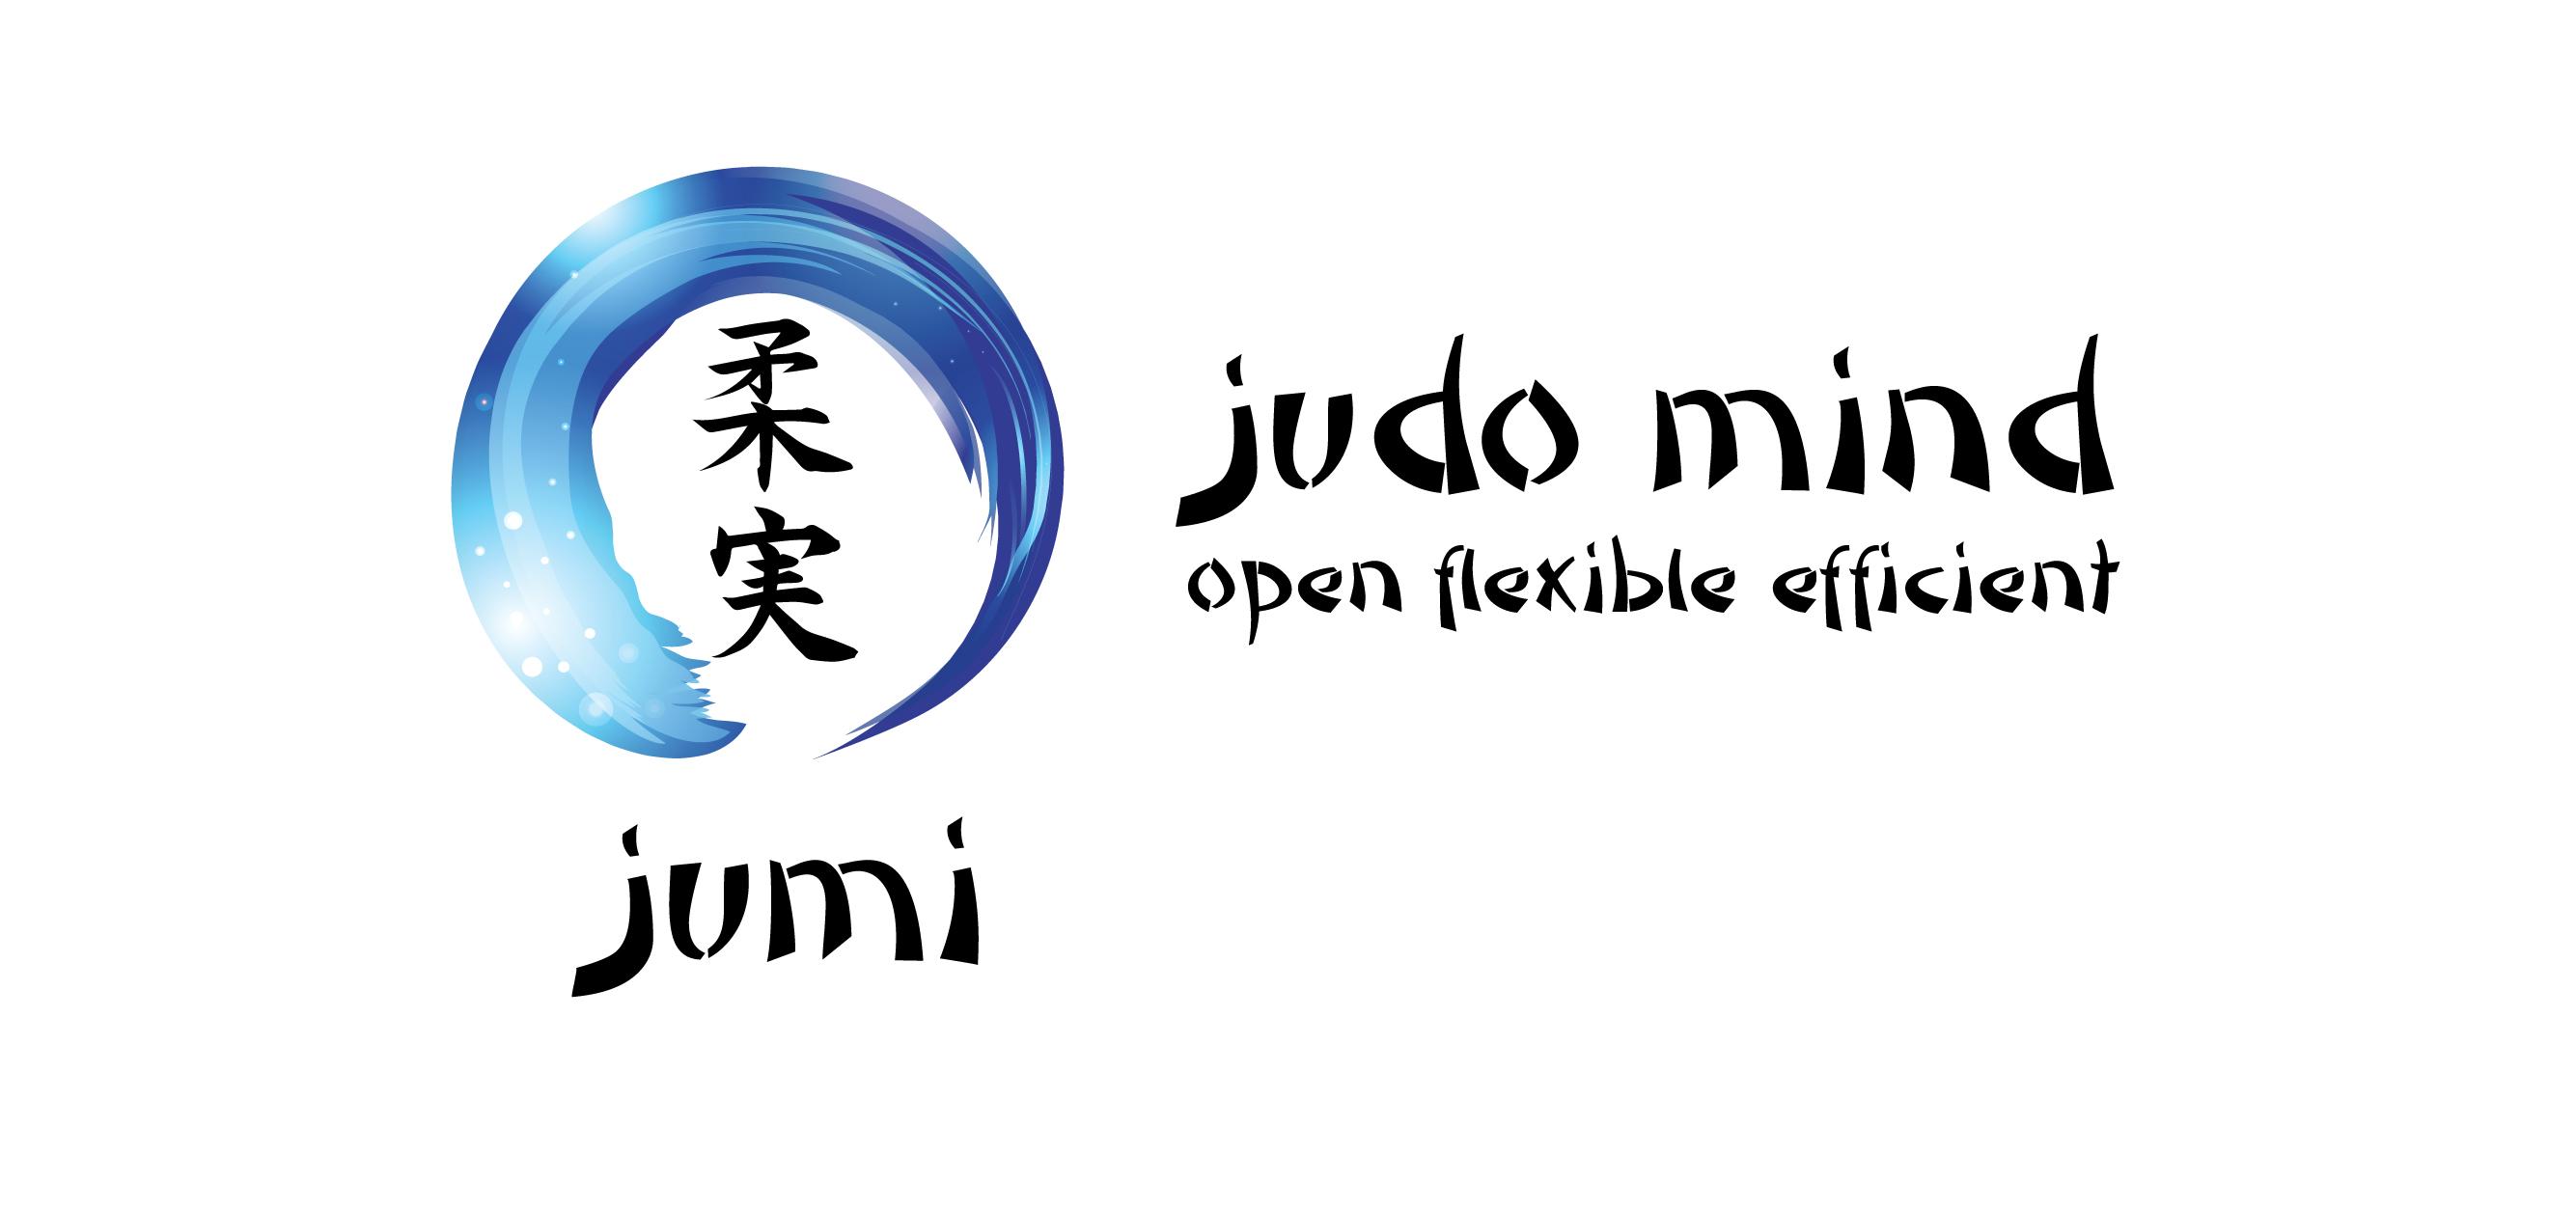 Jumi sessions with Jevon Dangeli